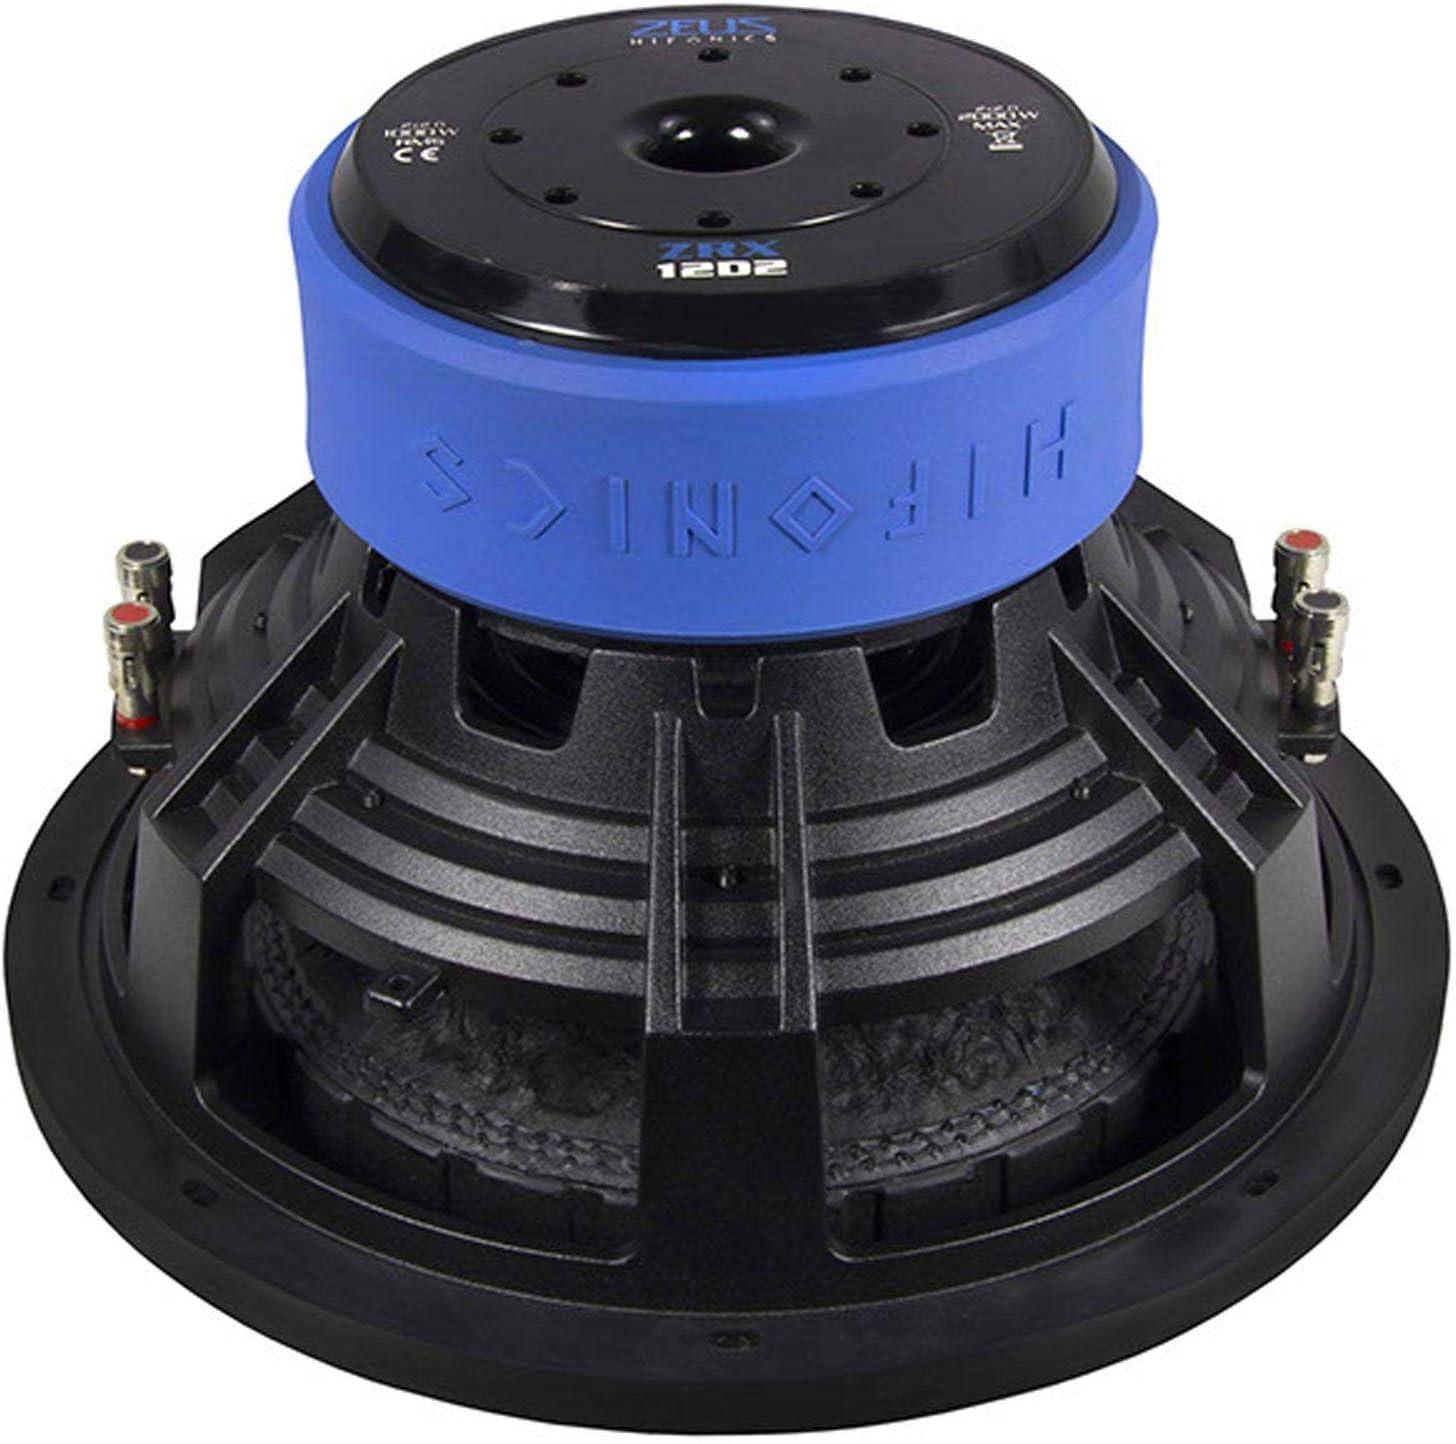 Hifonics Zrx 12d2 Auto Subwoofer Passiv 2000w Navigation